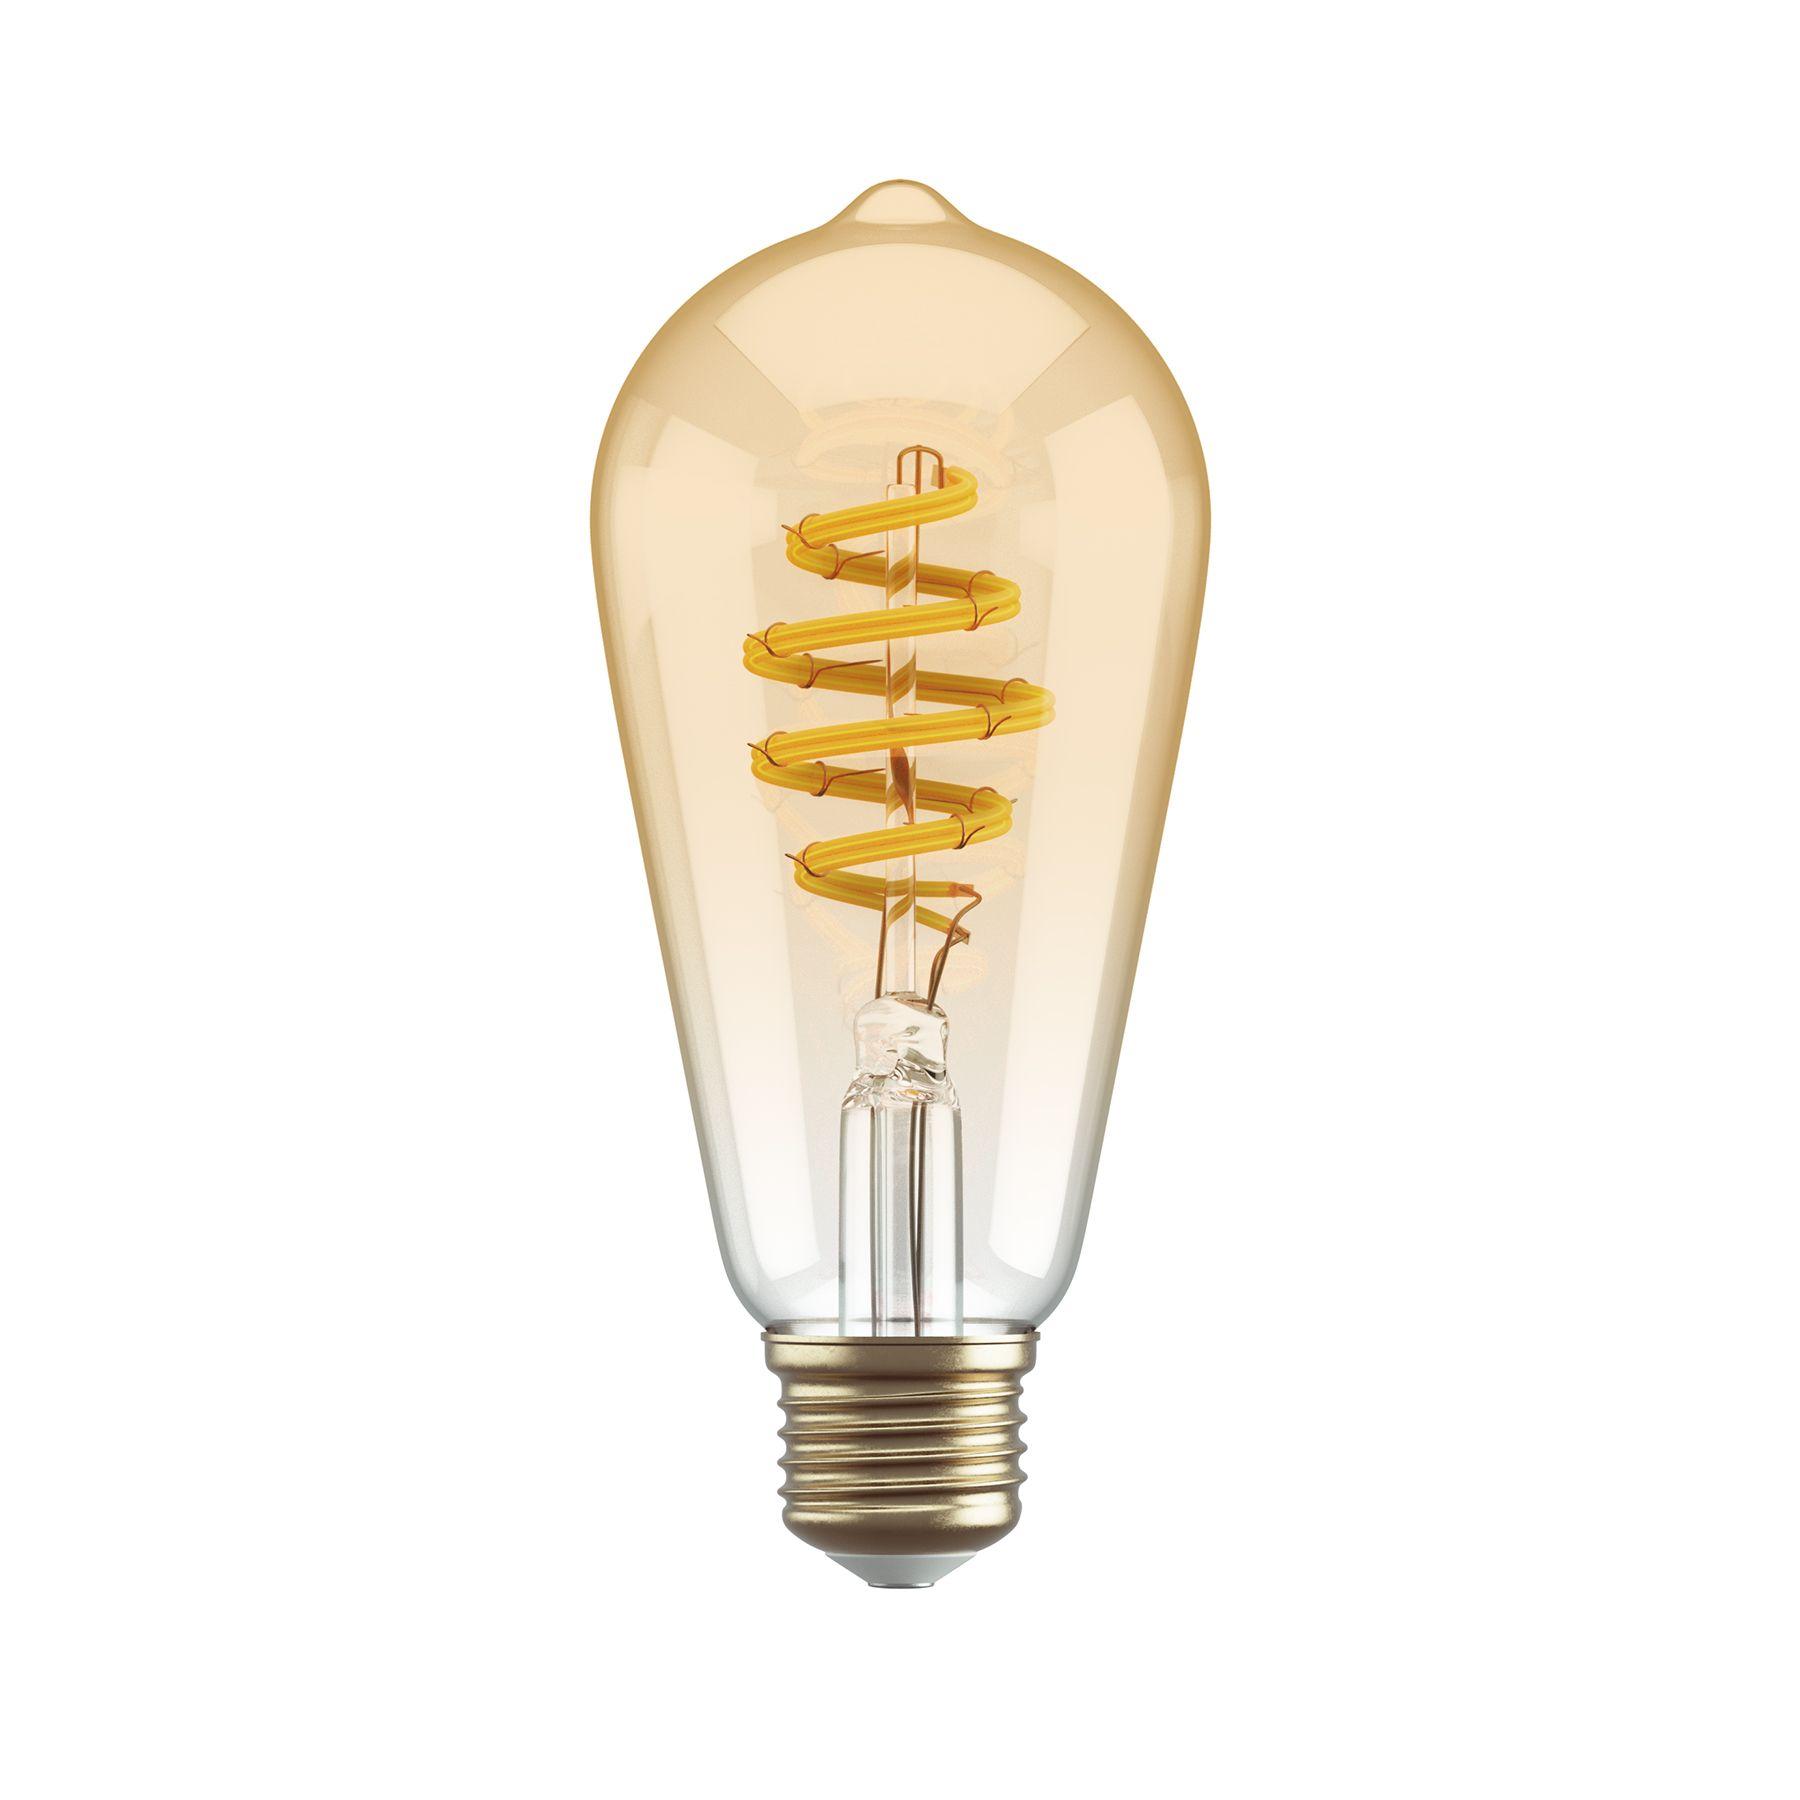 Hombli Slimme WiFi Lamp E27 ST64